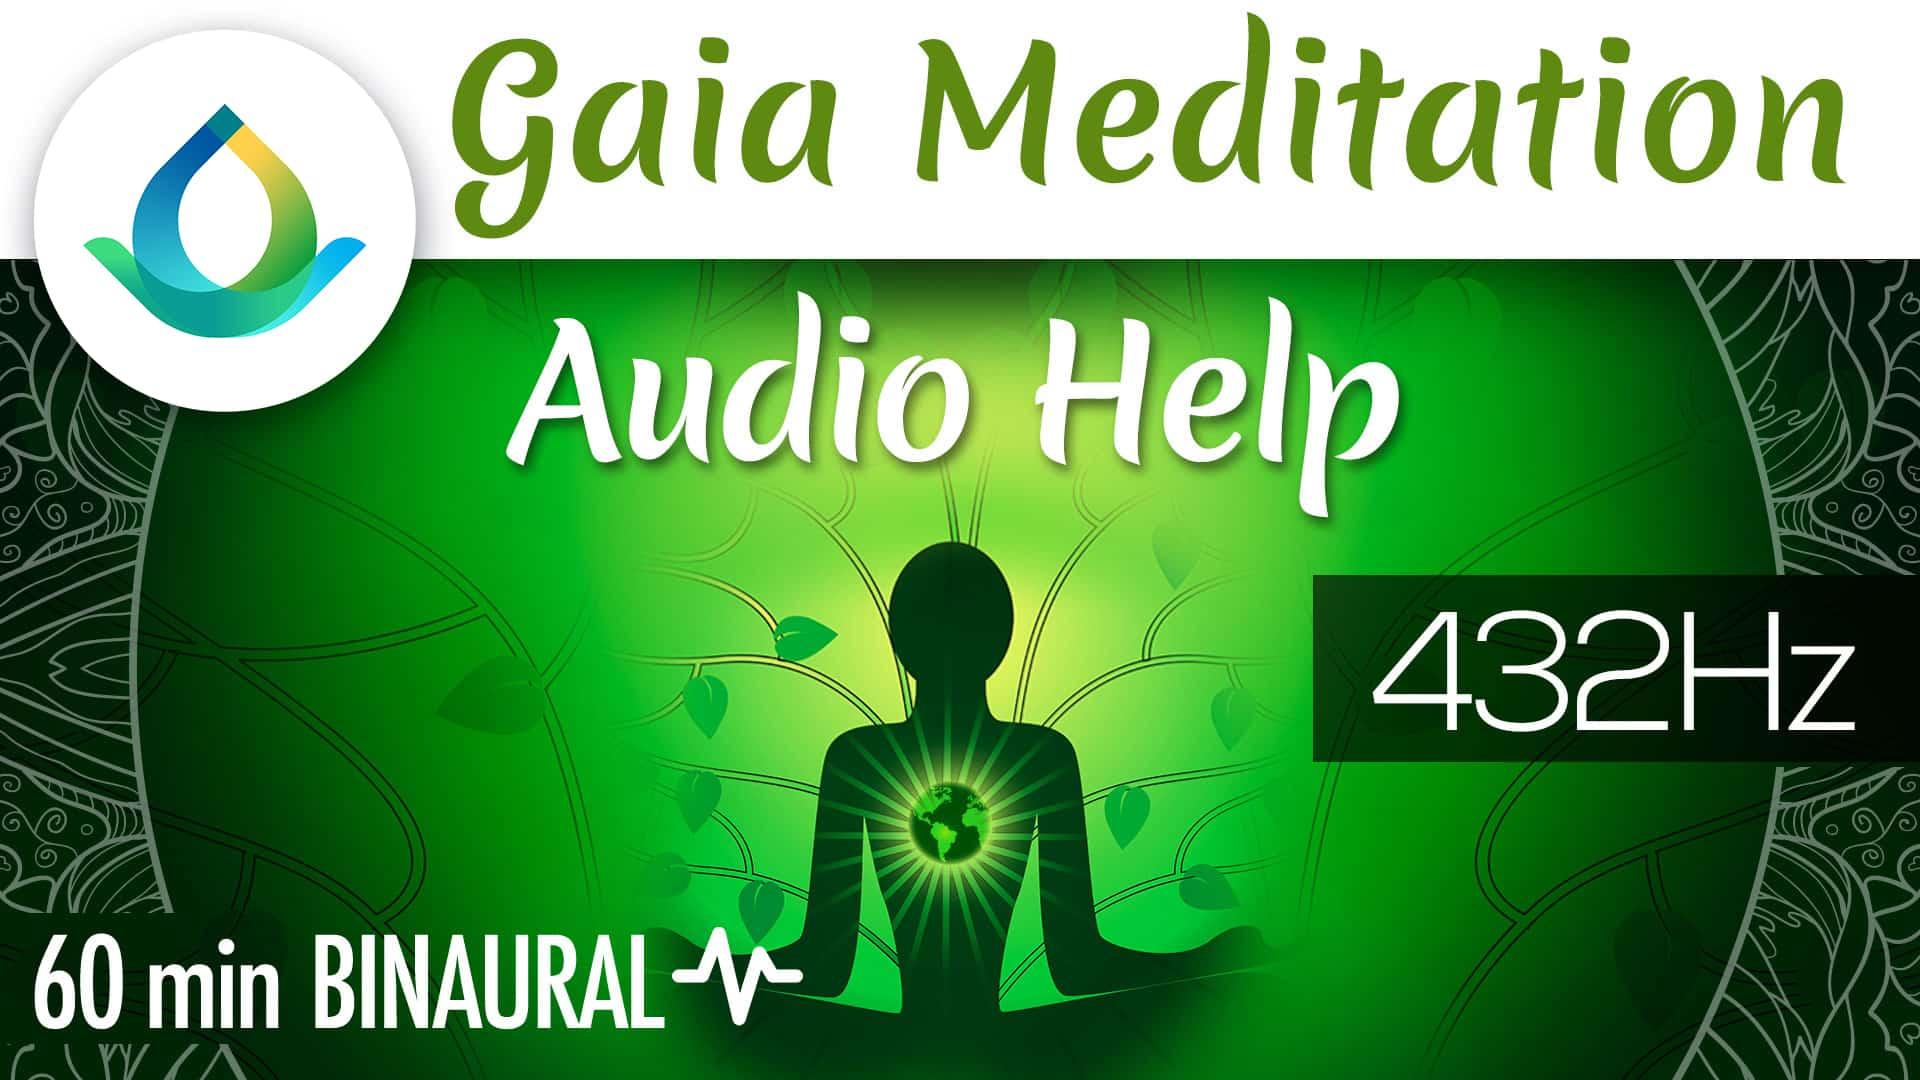 Gaia Meditation Audio Help